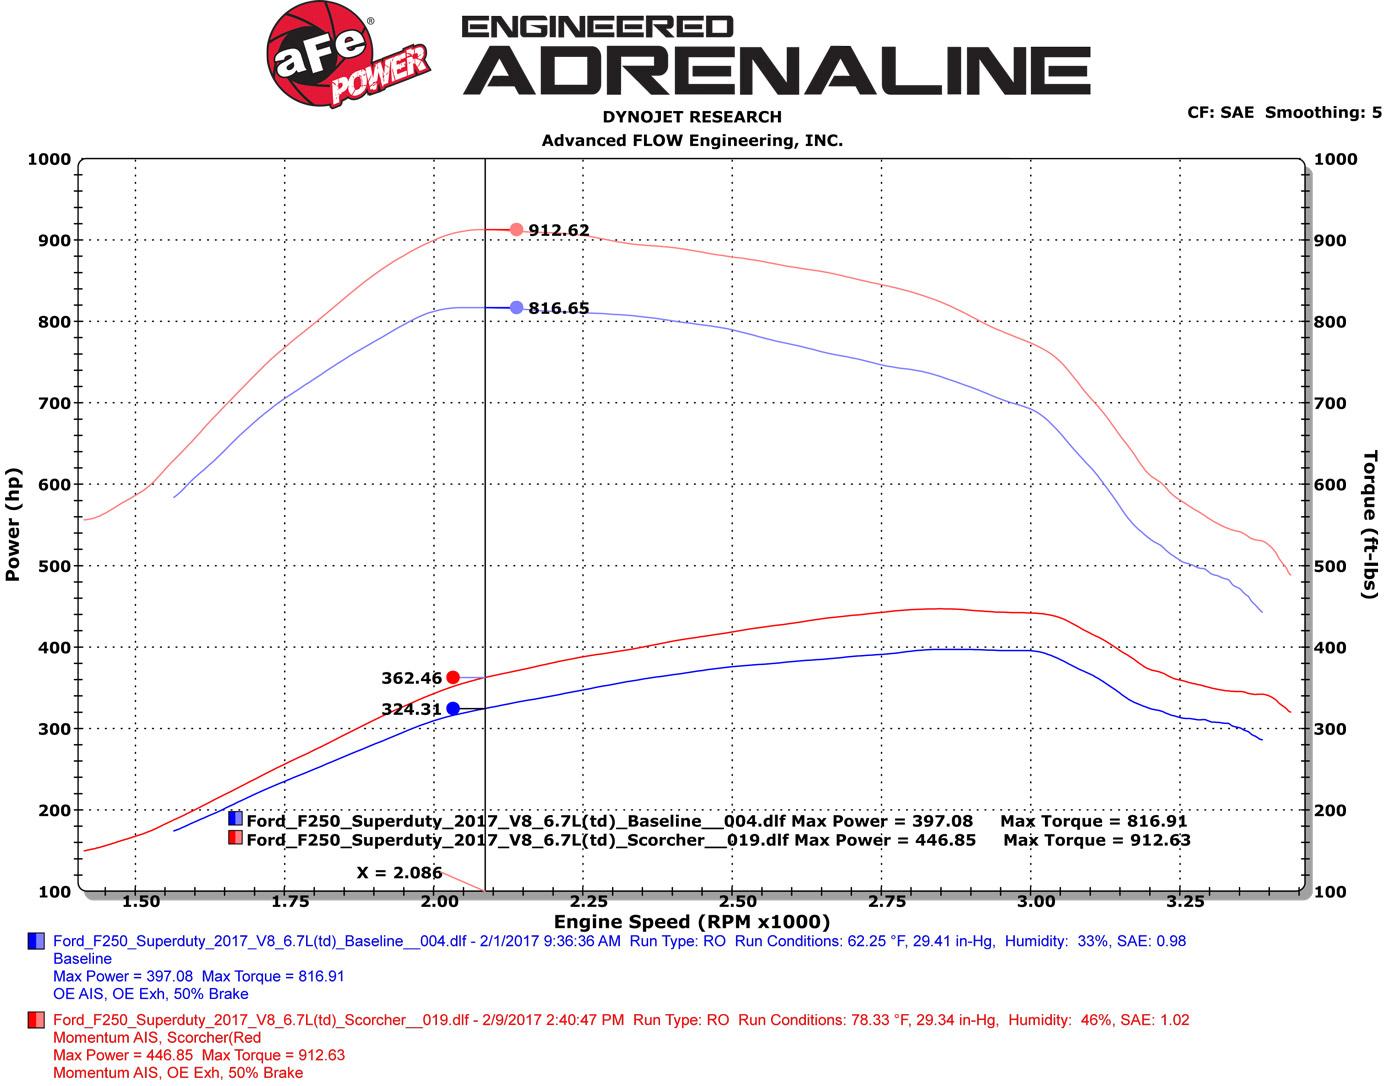 hight resolution of 2017 ford f 250 superduty afe scorcher run